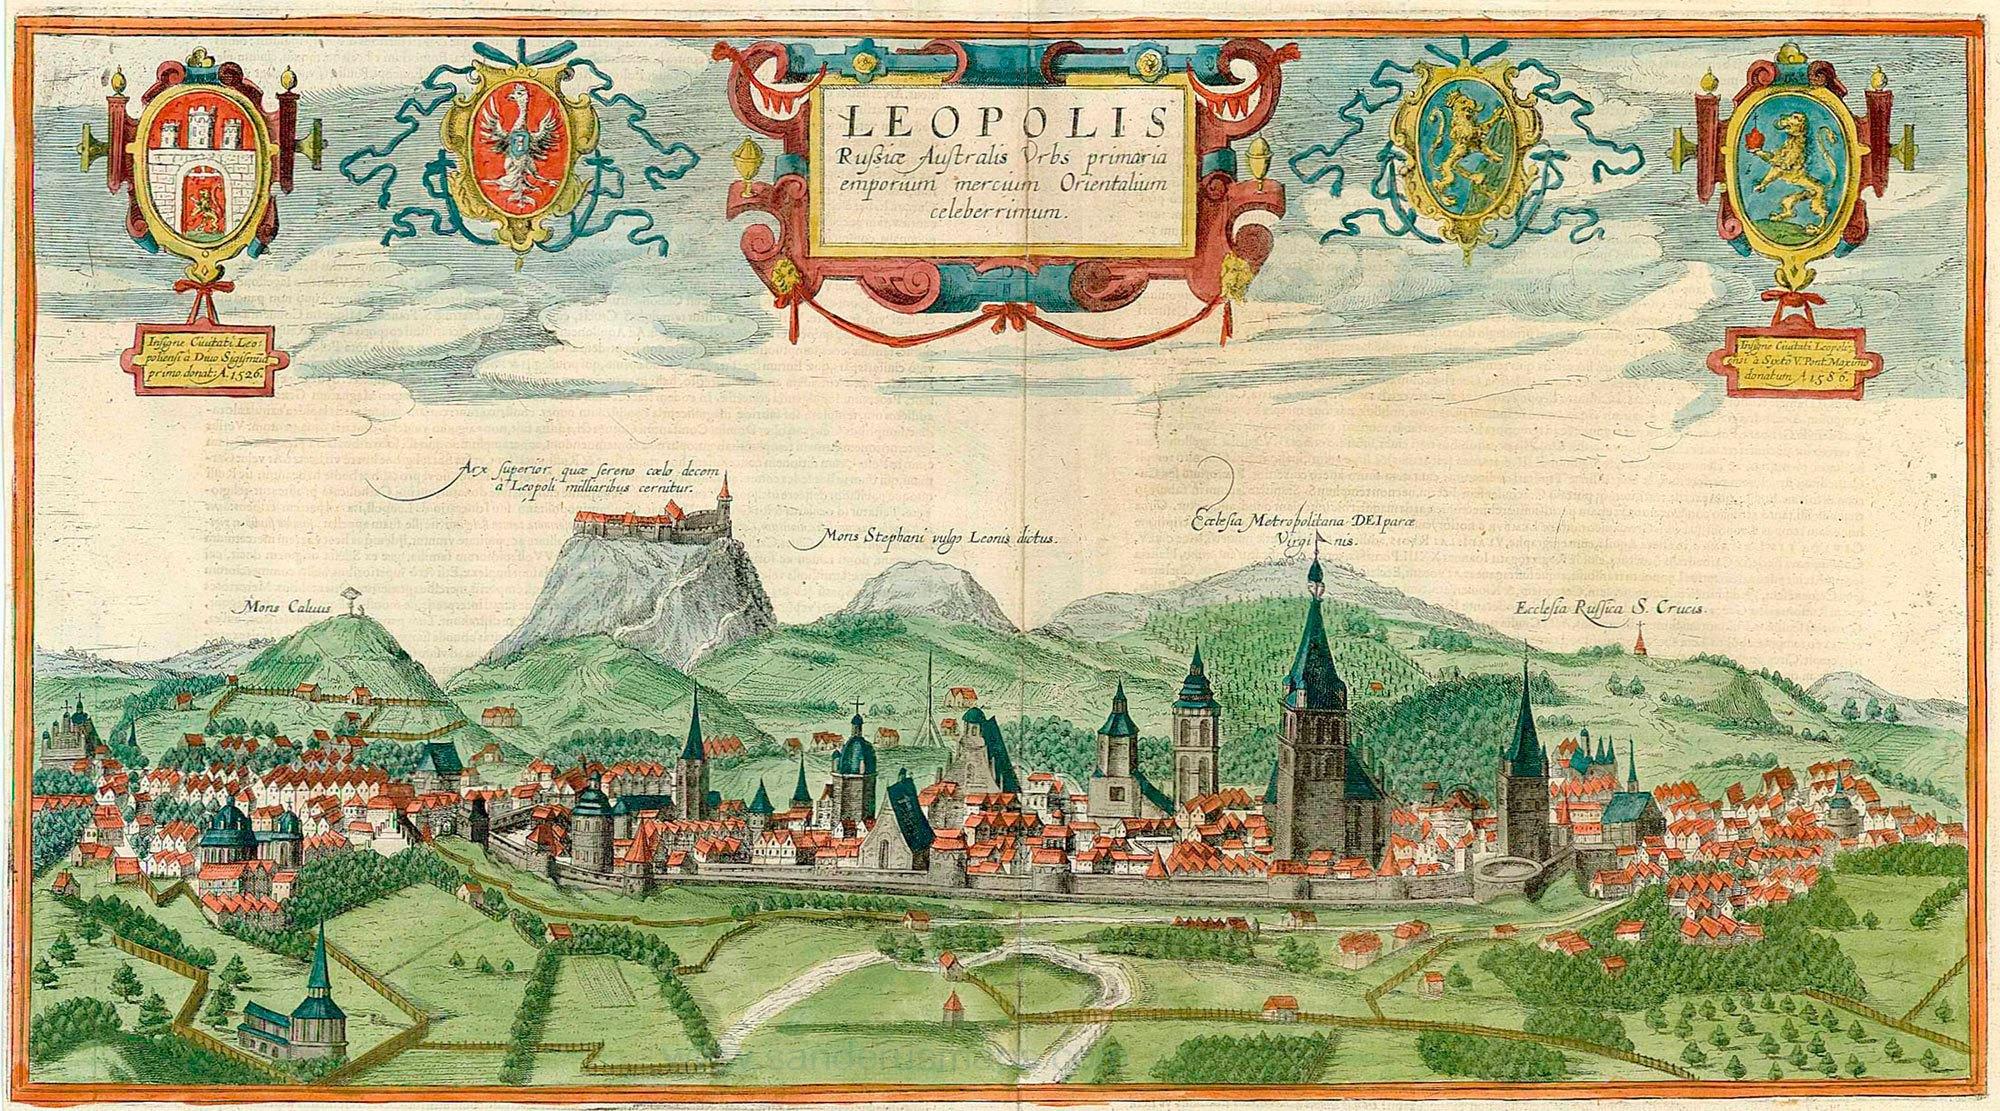 Панорама Львова Абрагама Гоґенберґа/Ауреліо Пассаротті, 1617-1618 © WIKI